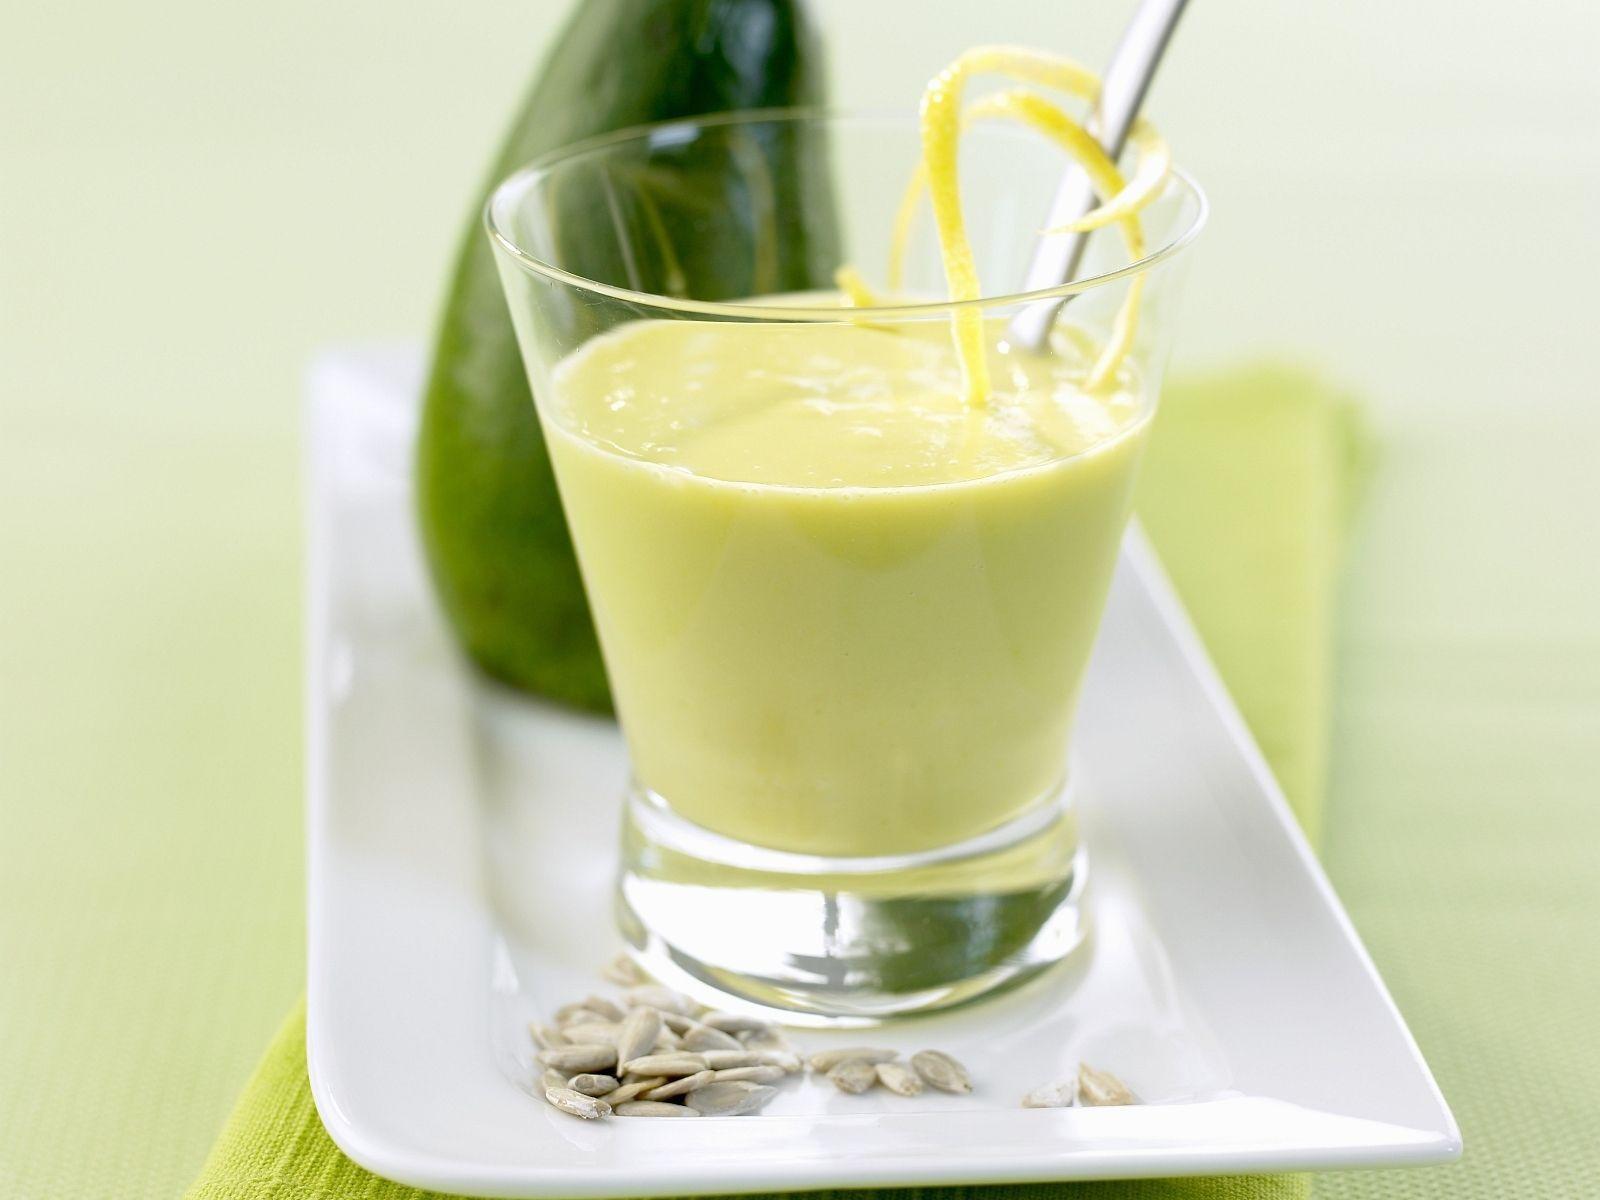 Avocado-Buttermilch-Smoothie | Rezept | Pinterest | Buttermilch ...